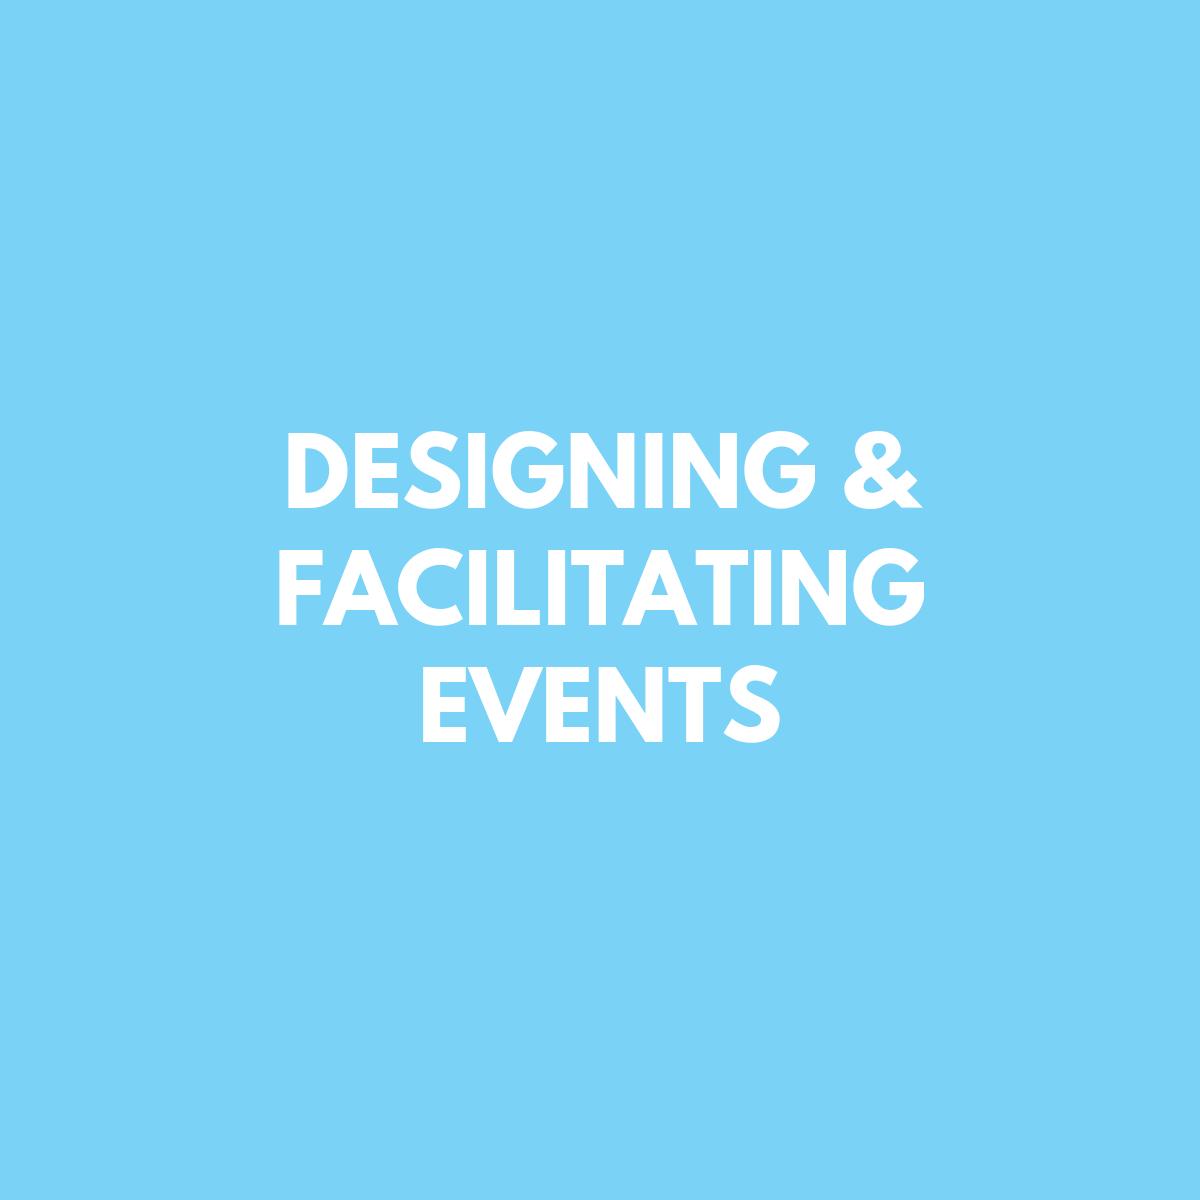 Designing & Facilitating Events